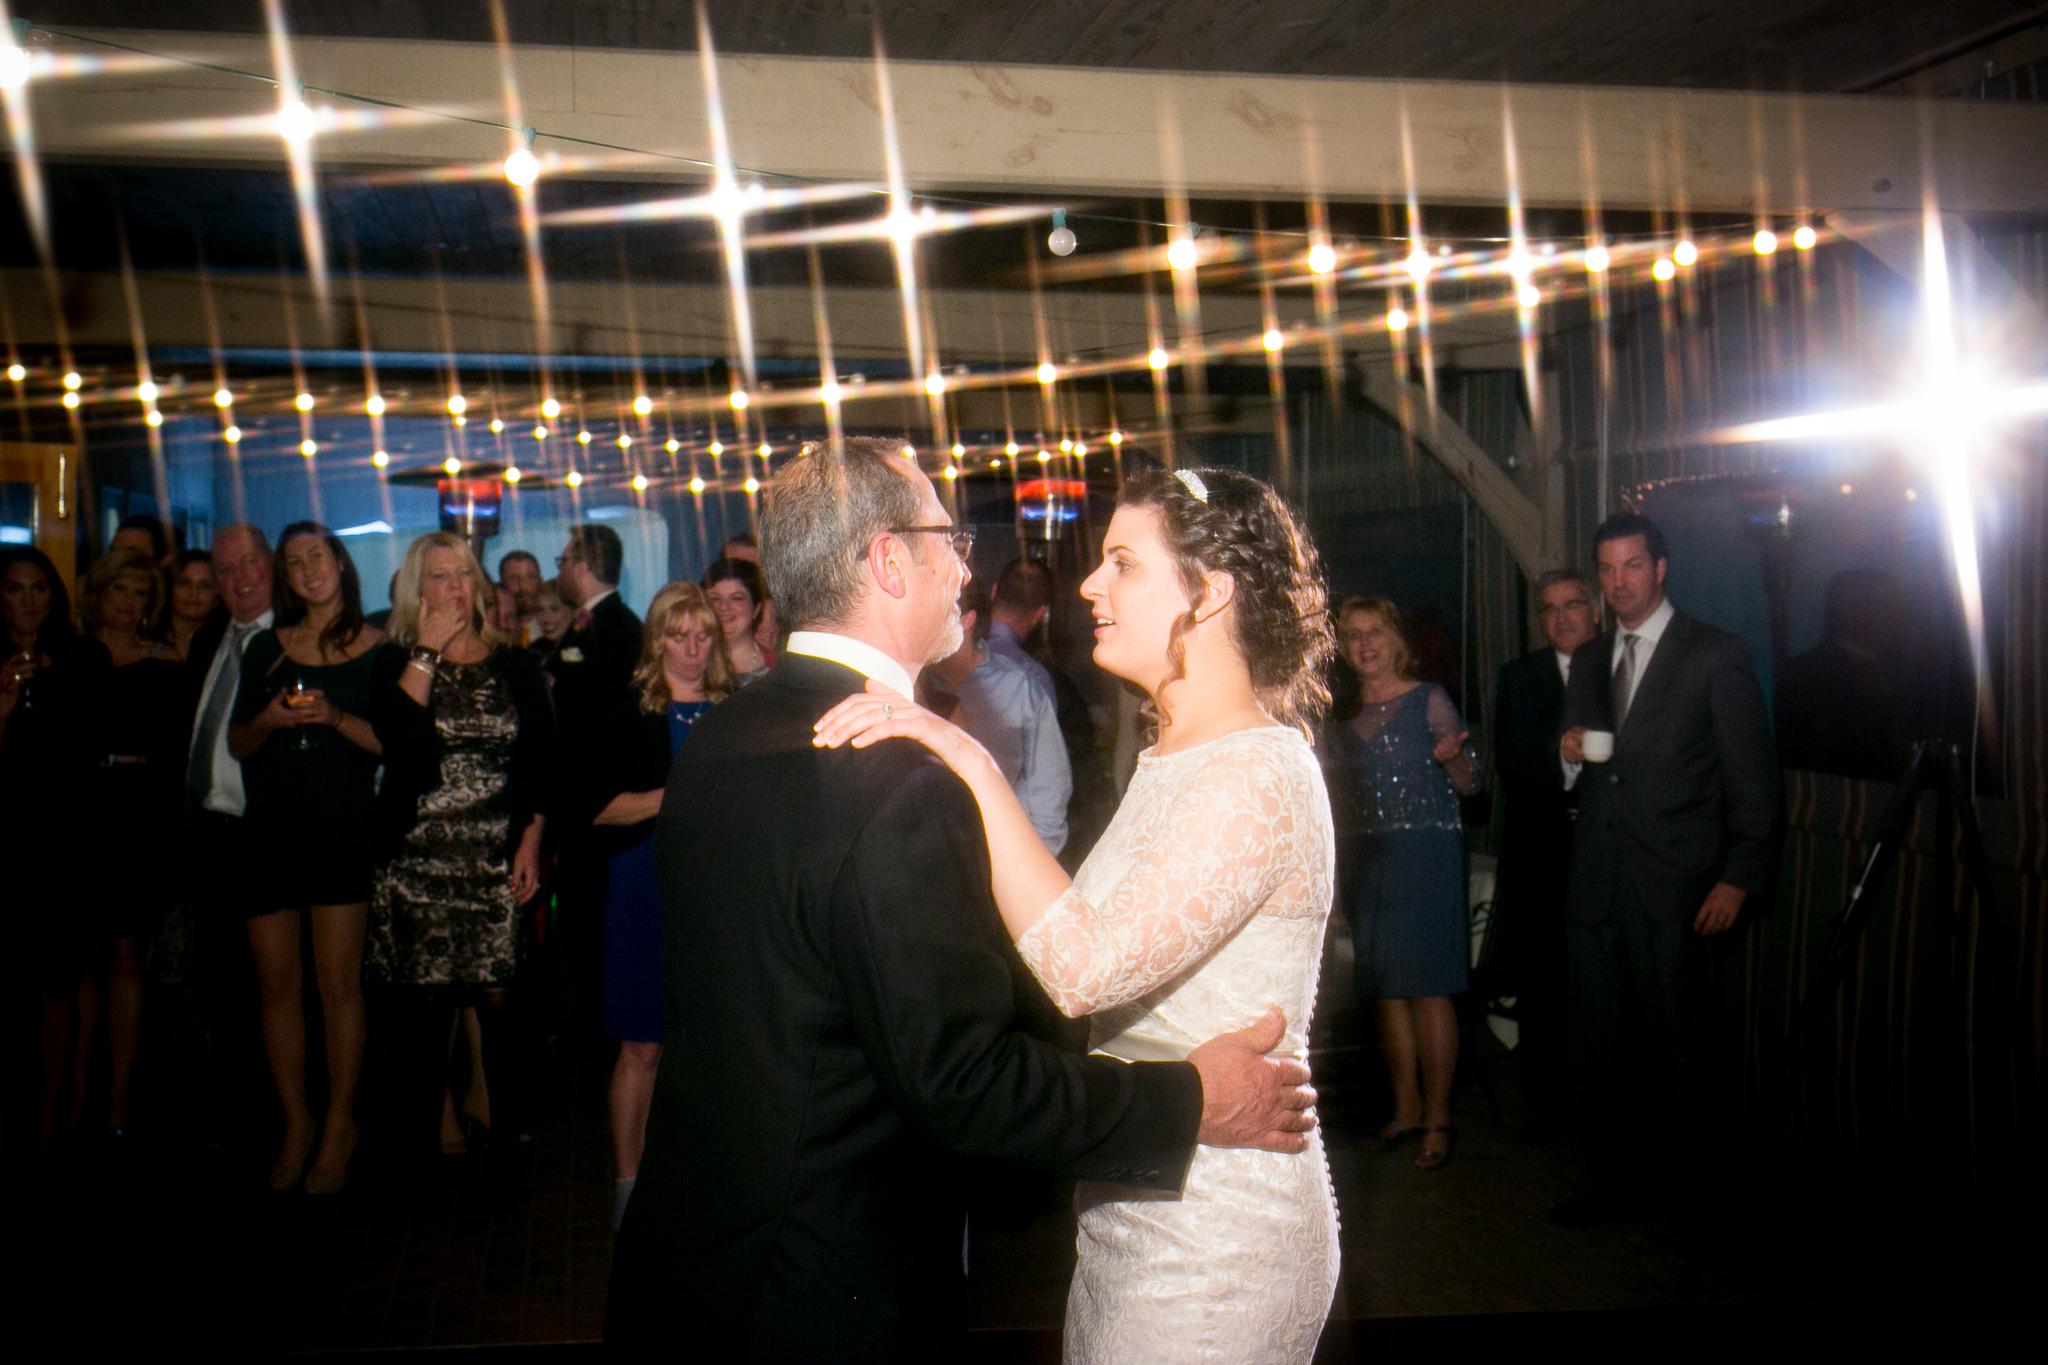 camuglia-whomstudio-chelsea_and_andy-nycphotographer-wedding-brooklyn-buffalo-timberlodge-122-5618.jpg